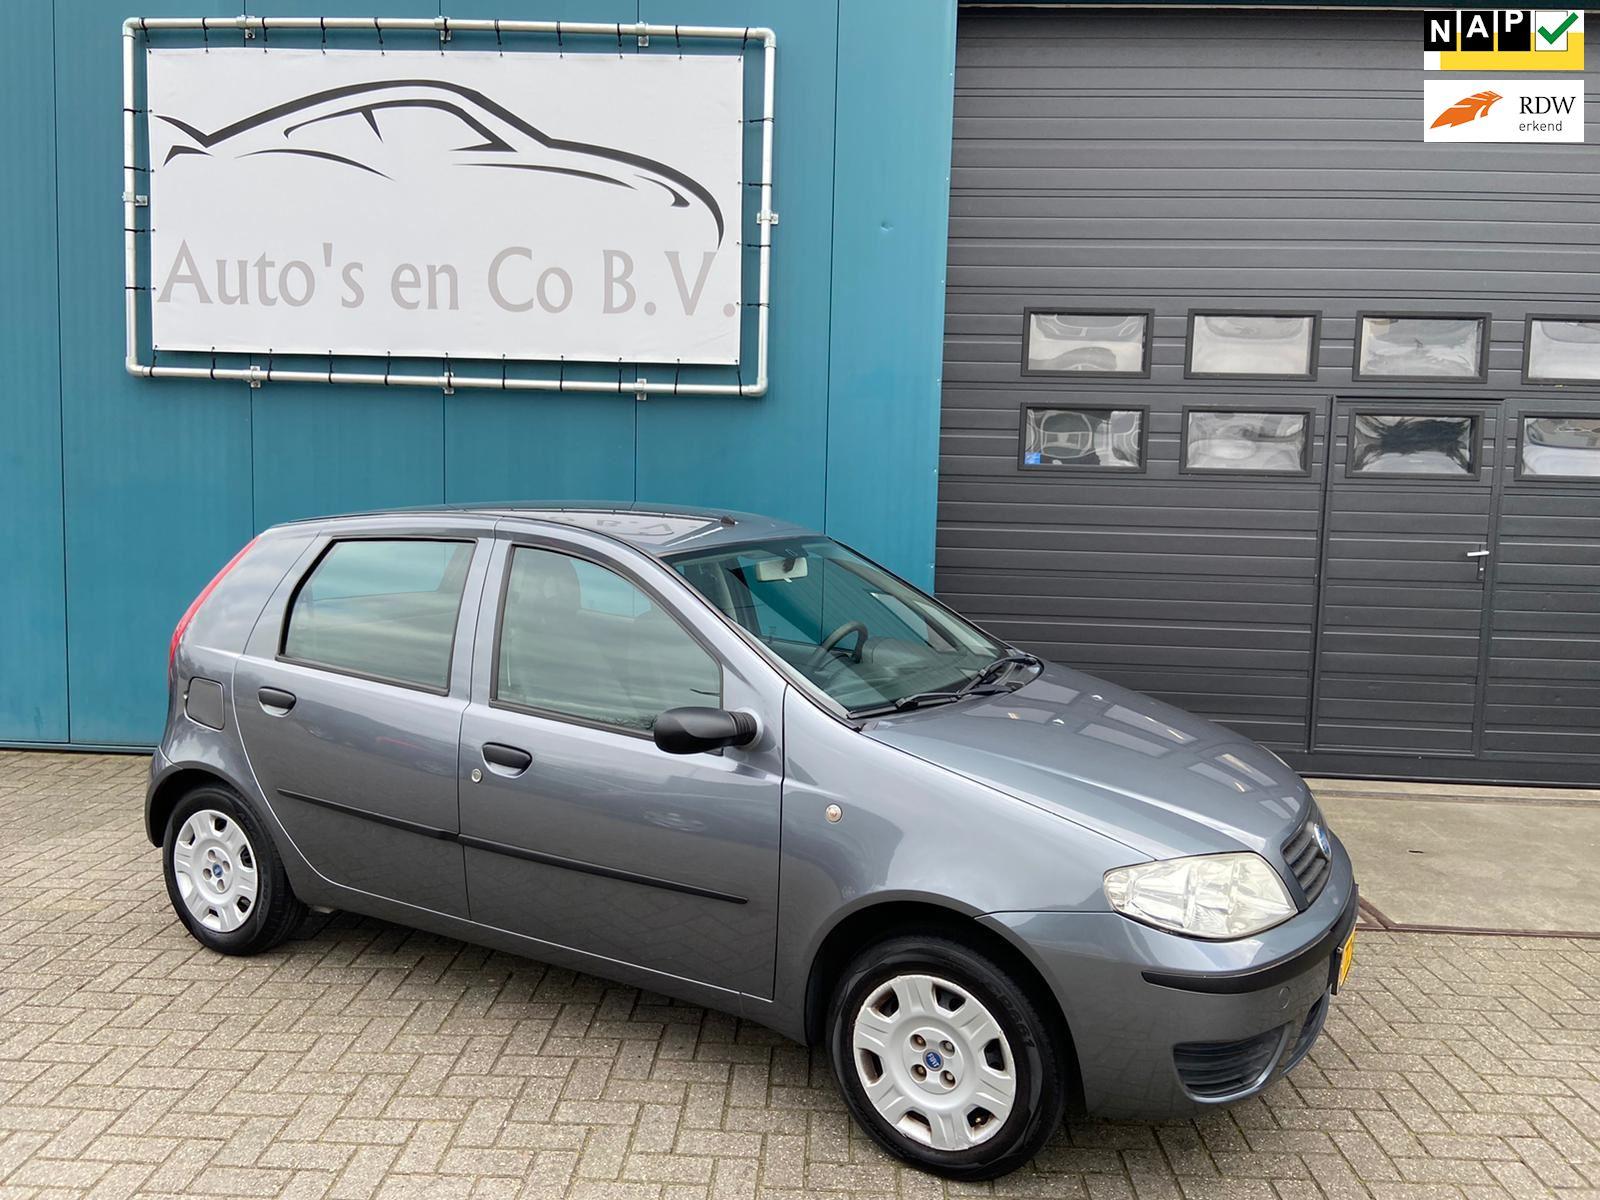 Fiat Punto occasion - Auto's en Co B.V.